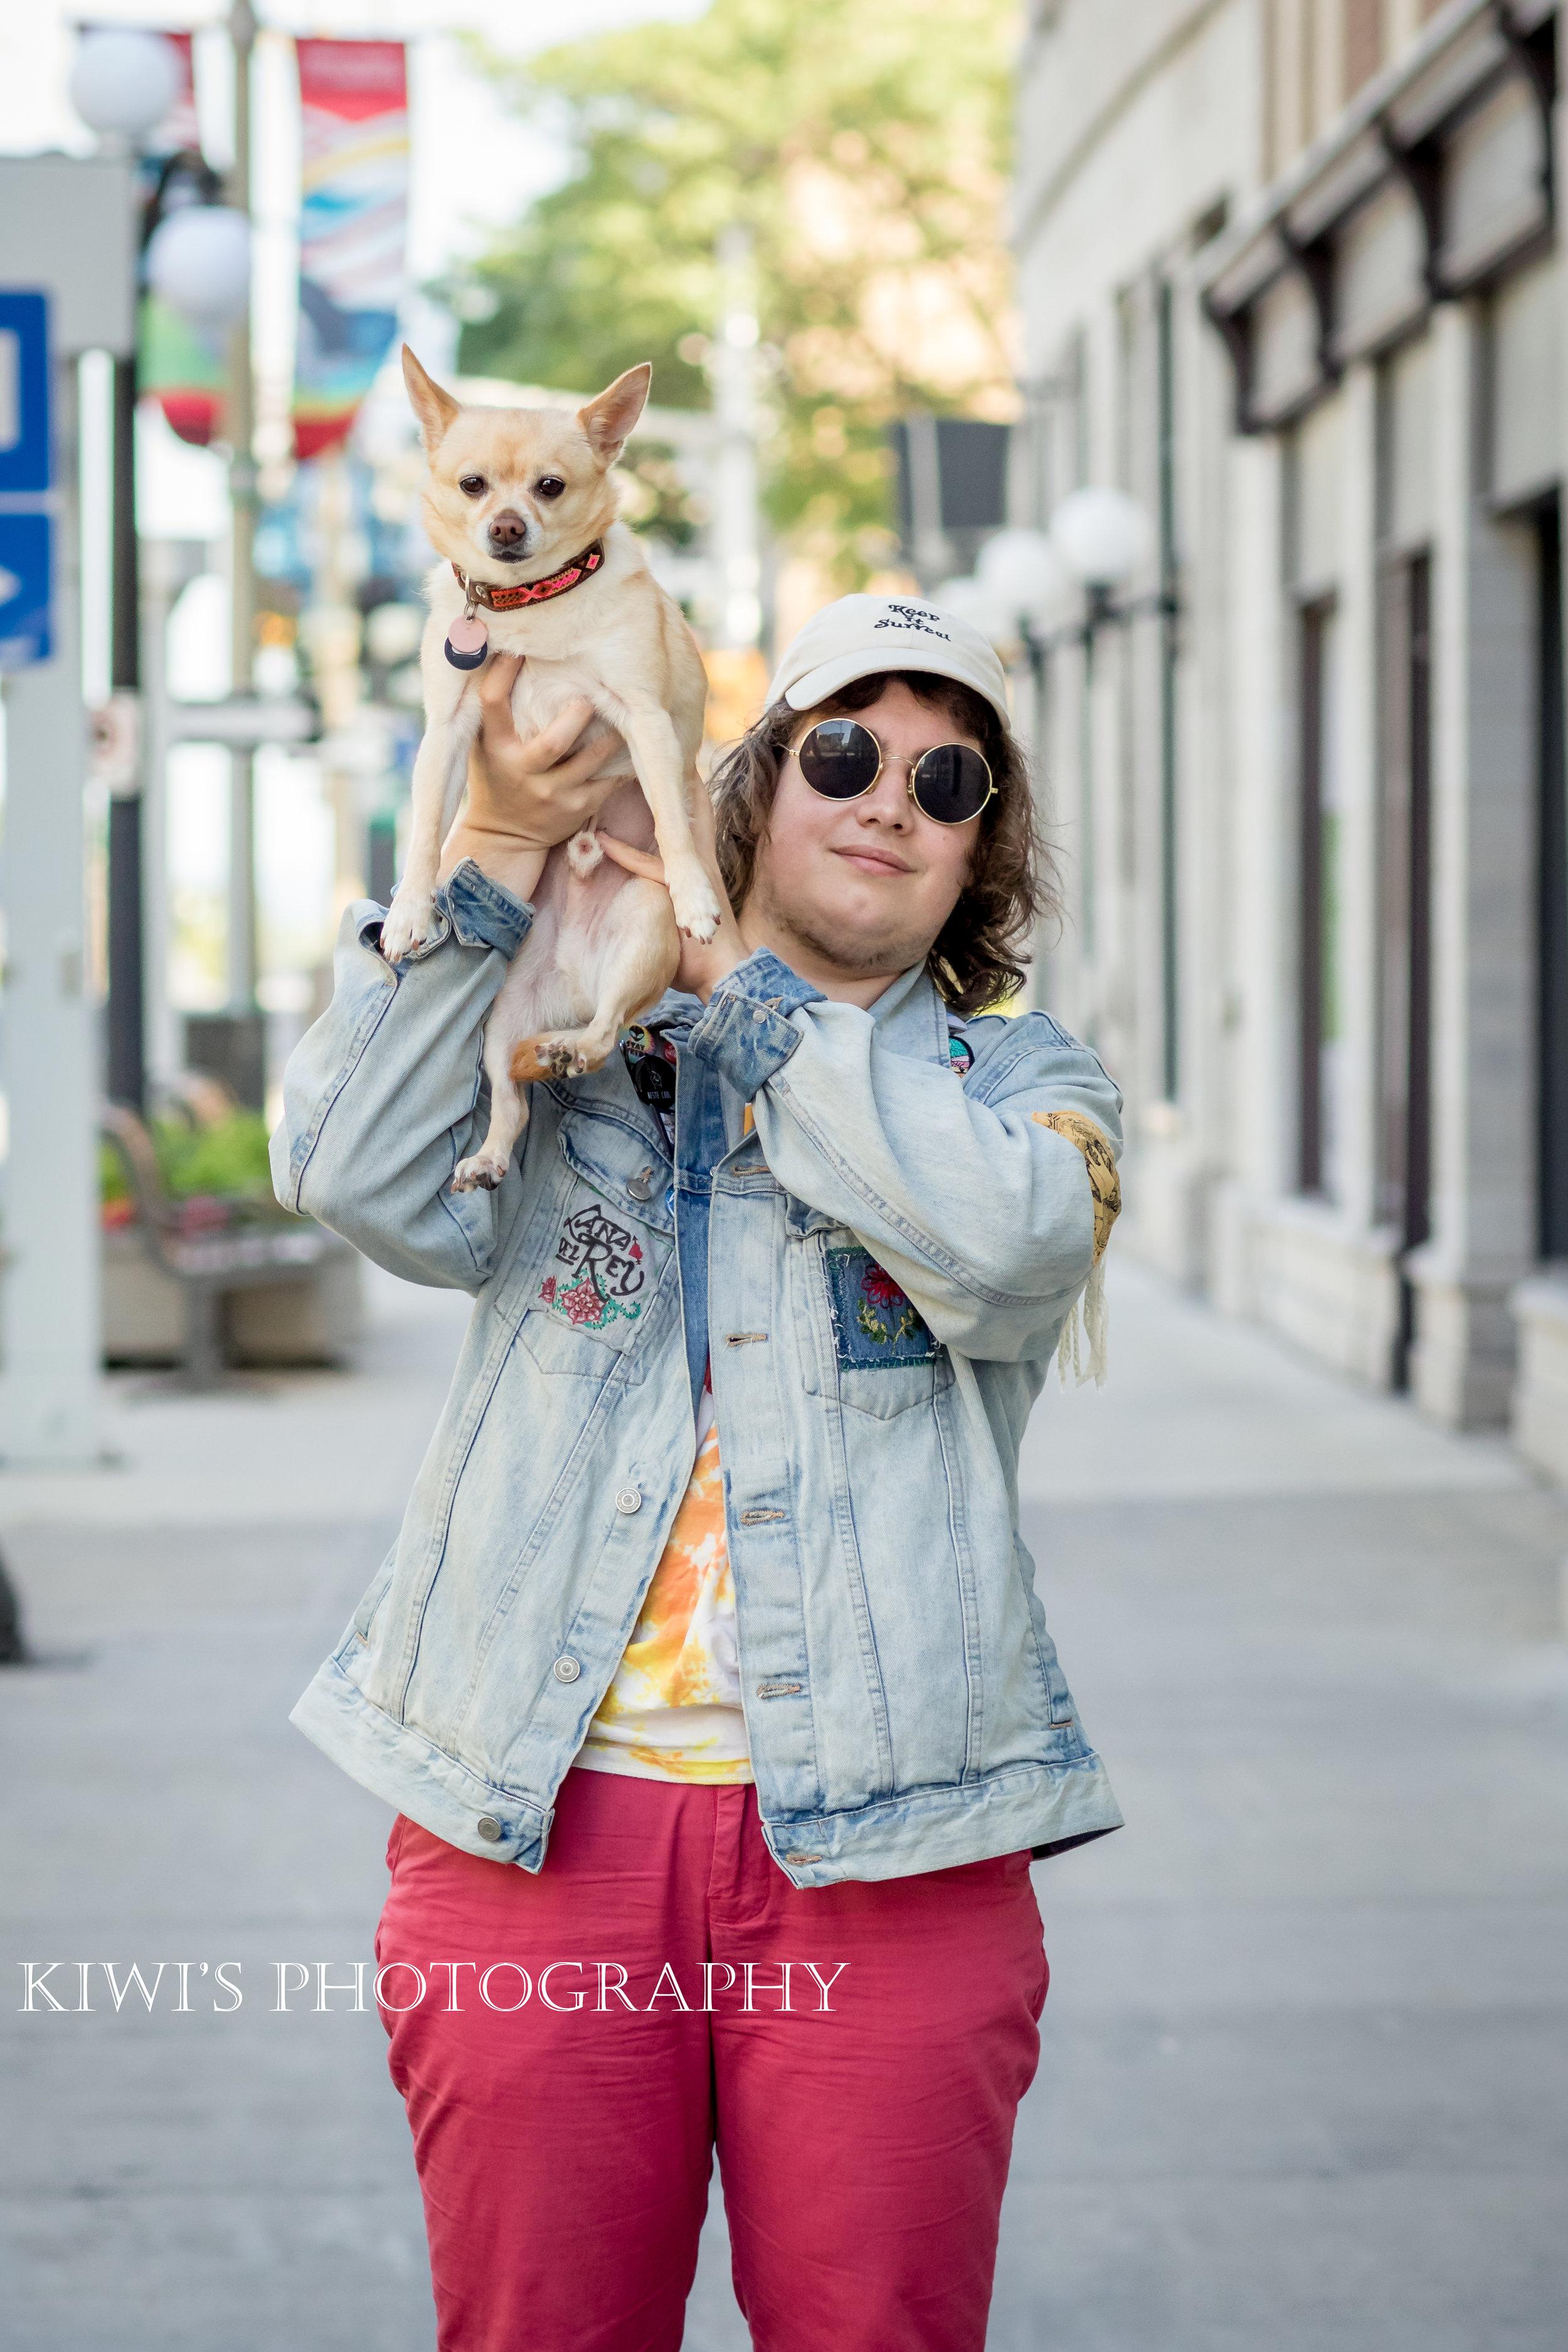 How I met my Best Friend - Ellis & Mac A. Roni - ottawa pet photography